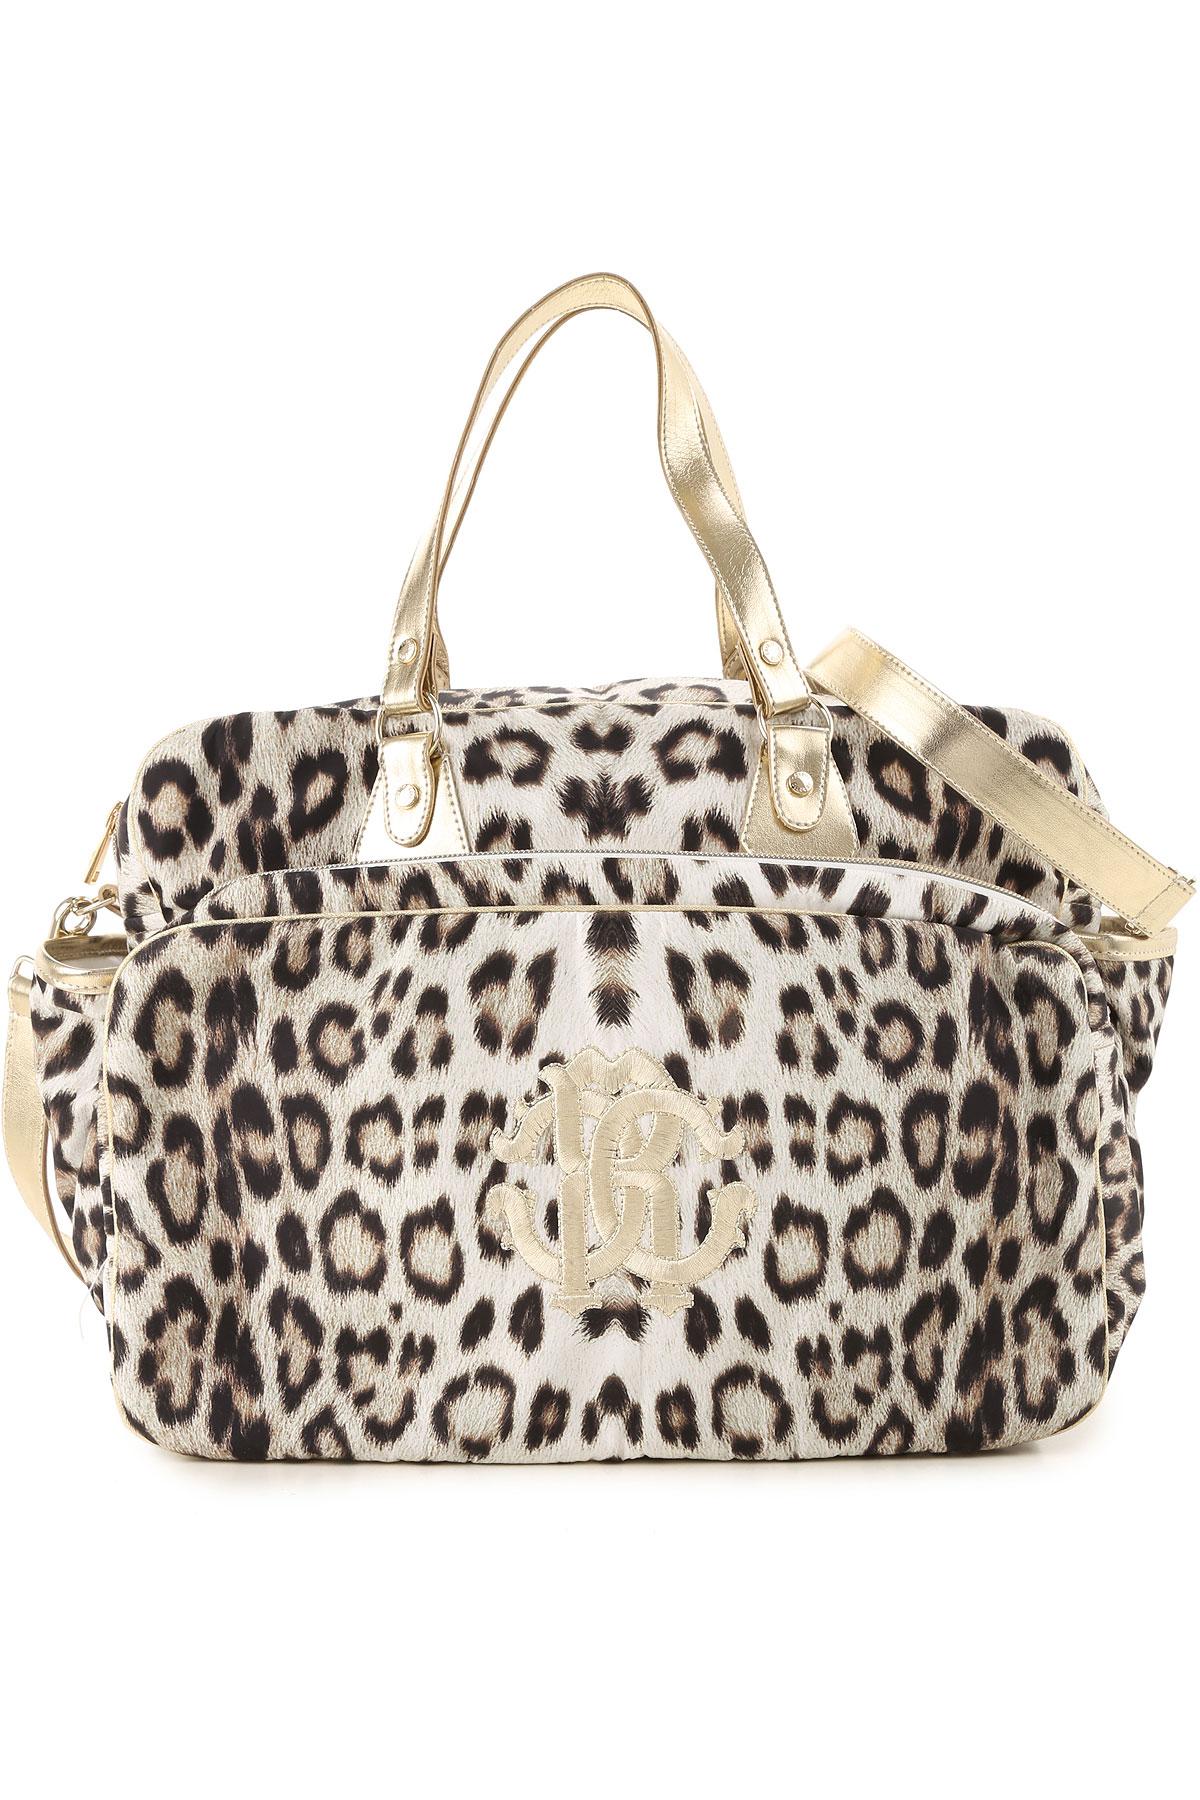 Roberto Cavalli Baby Girls Handbag On Sale, Leopard, polyester, 2019